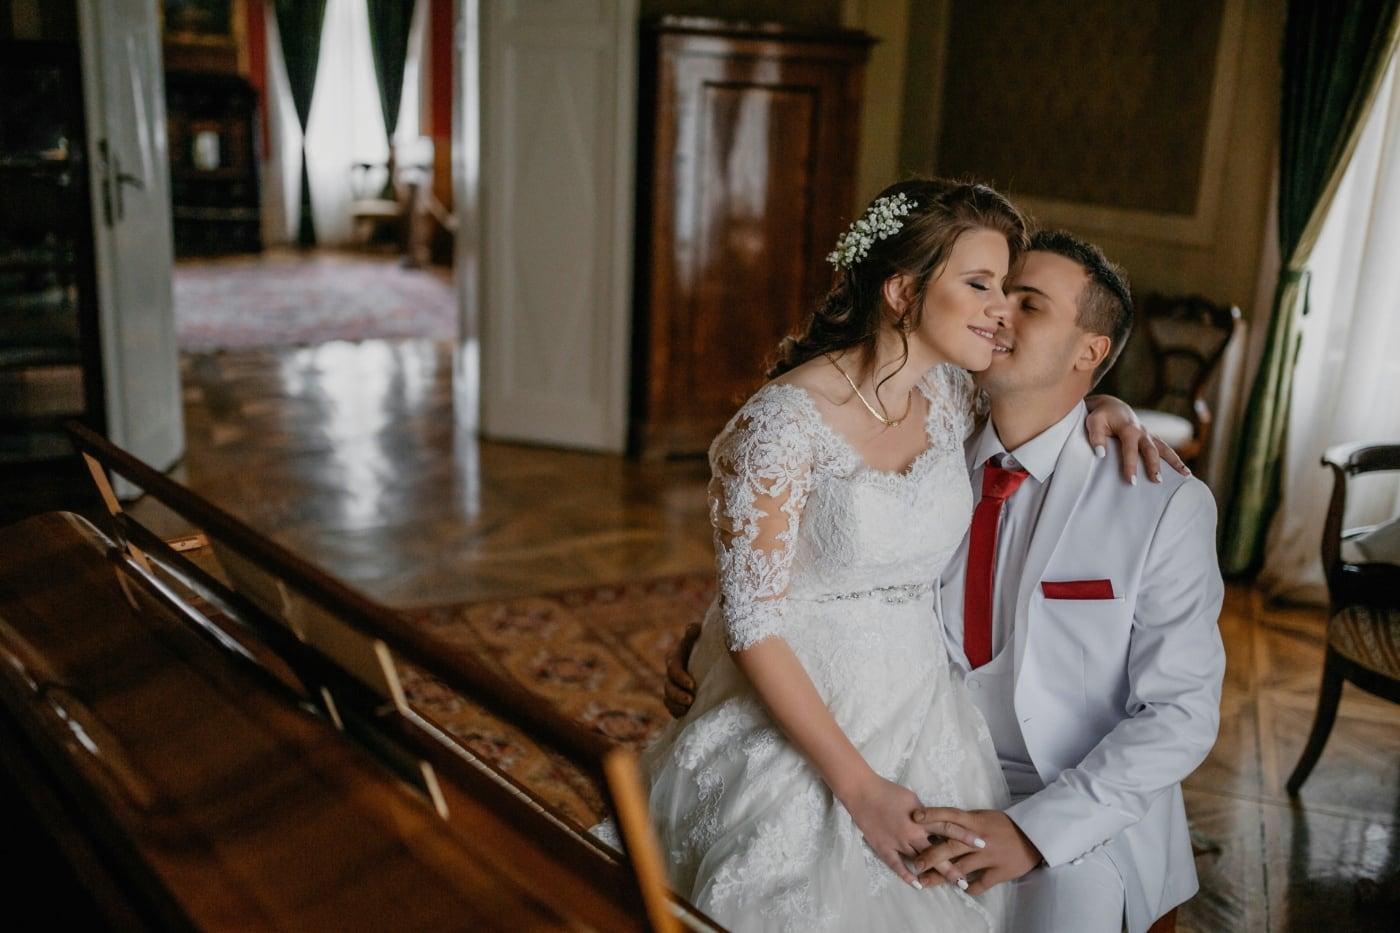 groom, piano, bride, pianist, love, kiss, hugging, woman, people, wedding